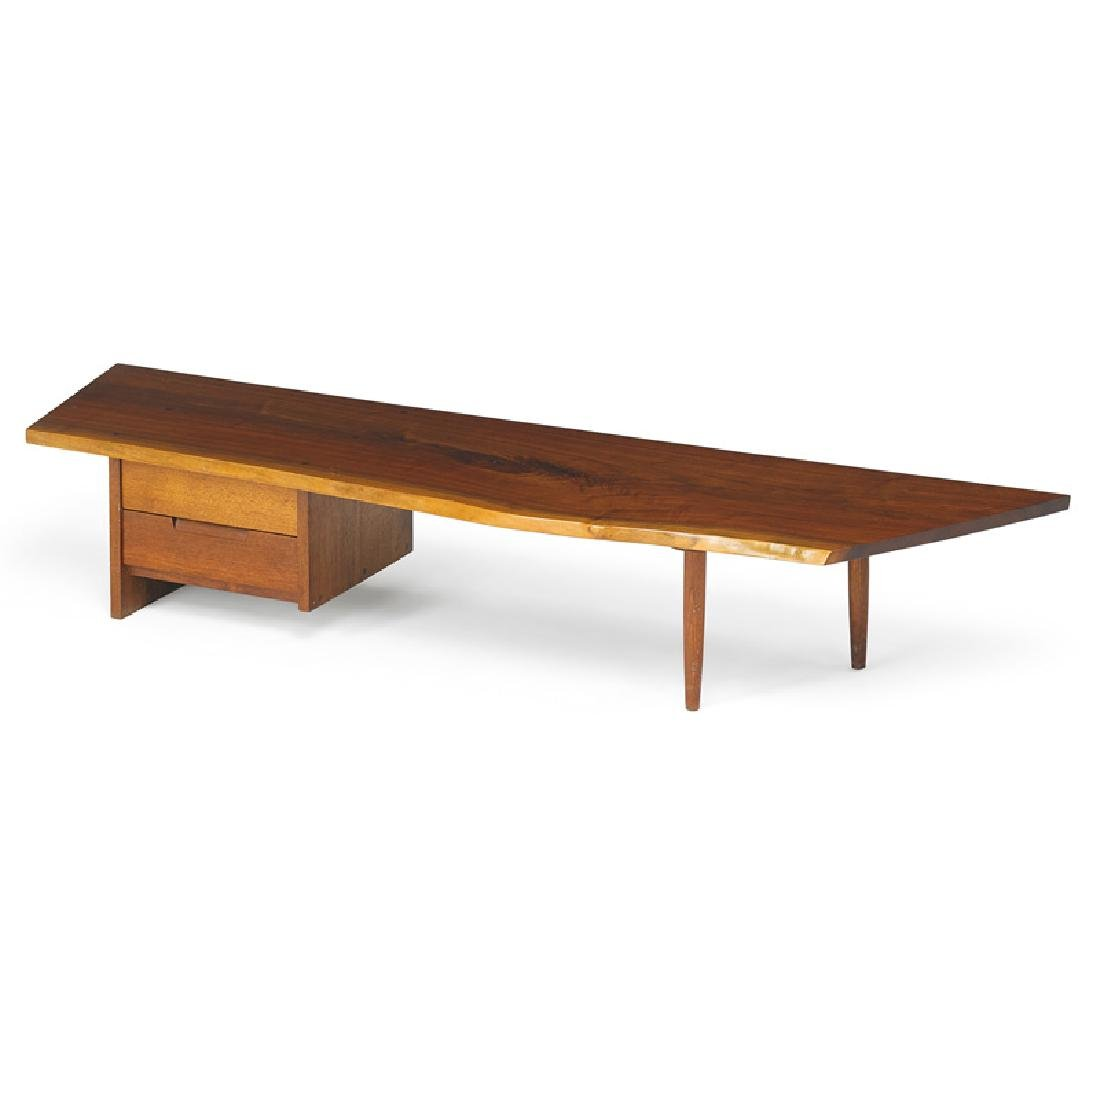 GEORGE NAKASHIMA Bench with drawers